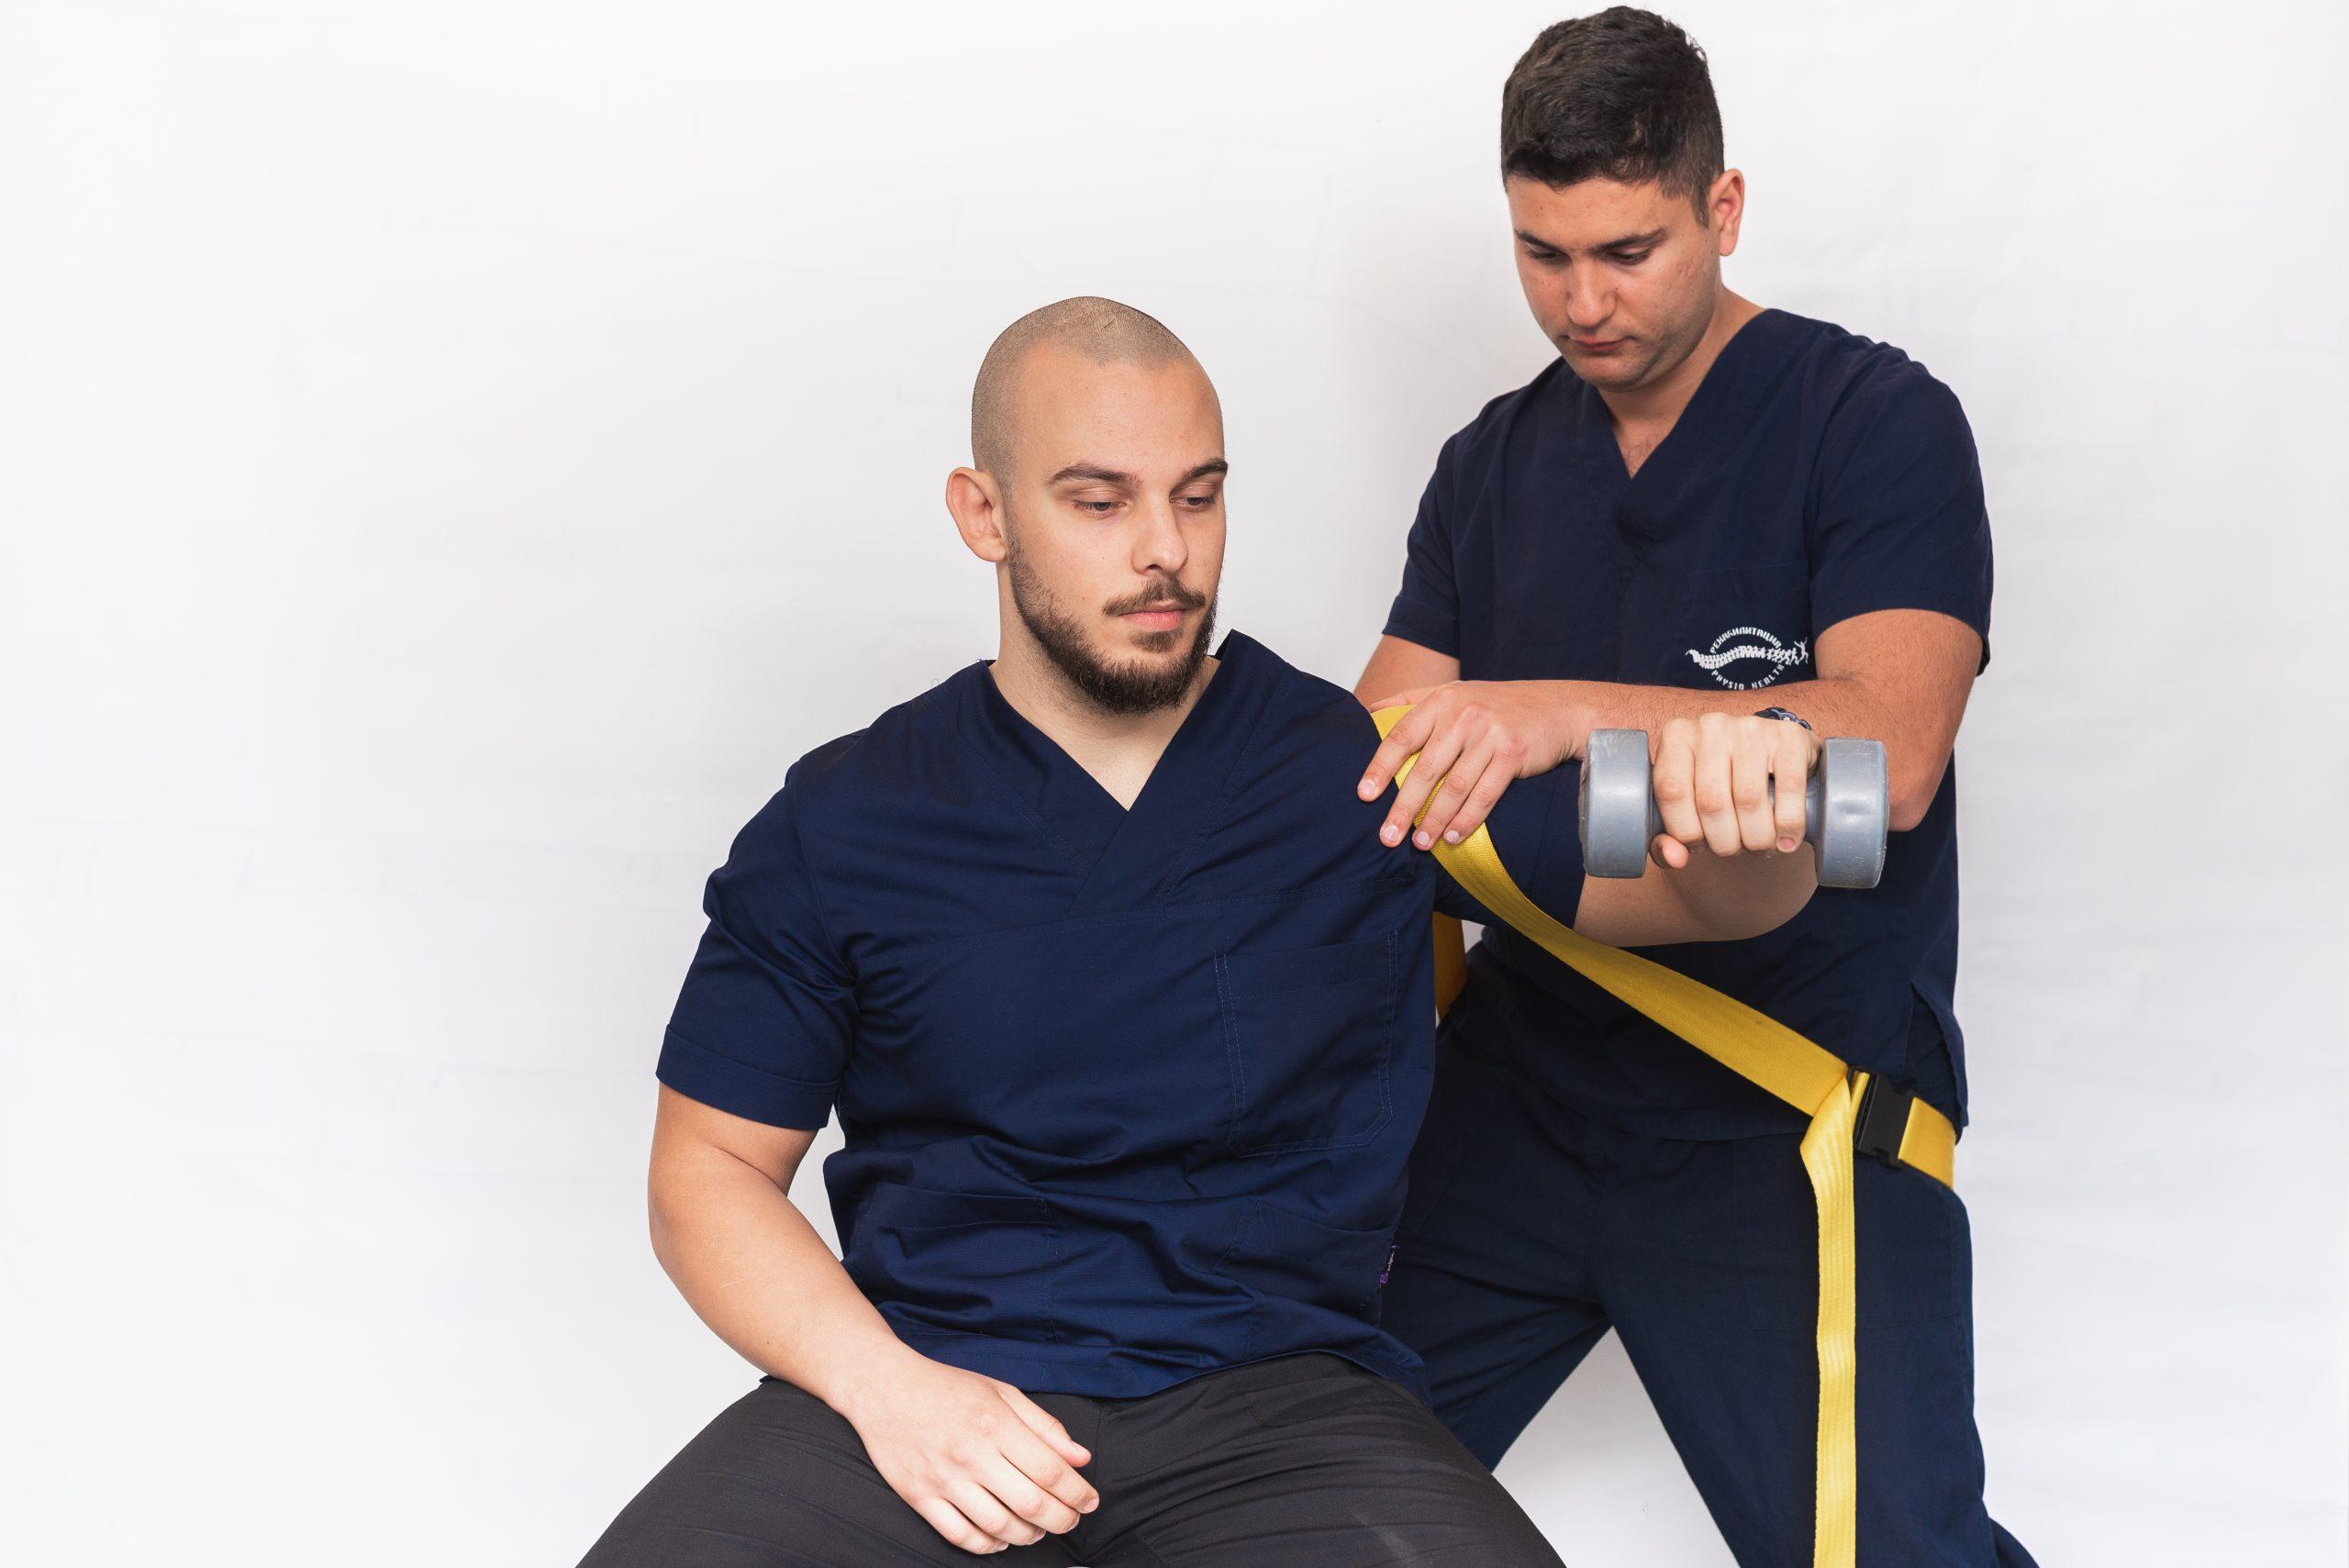 Physio-Health Rehabilitation Specialists